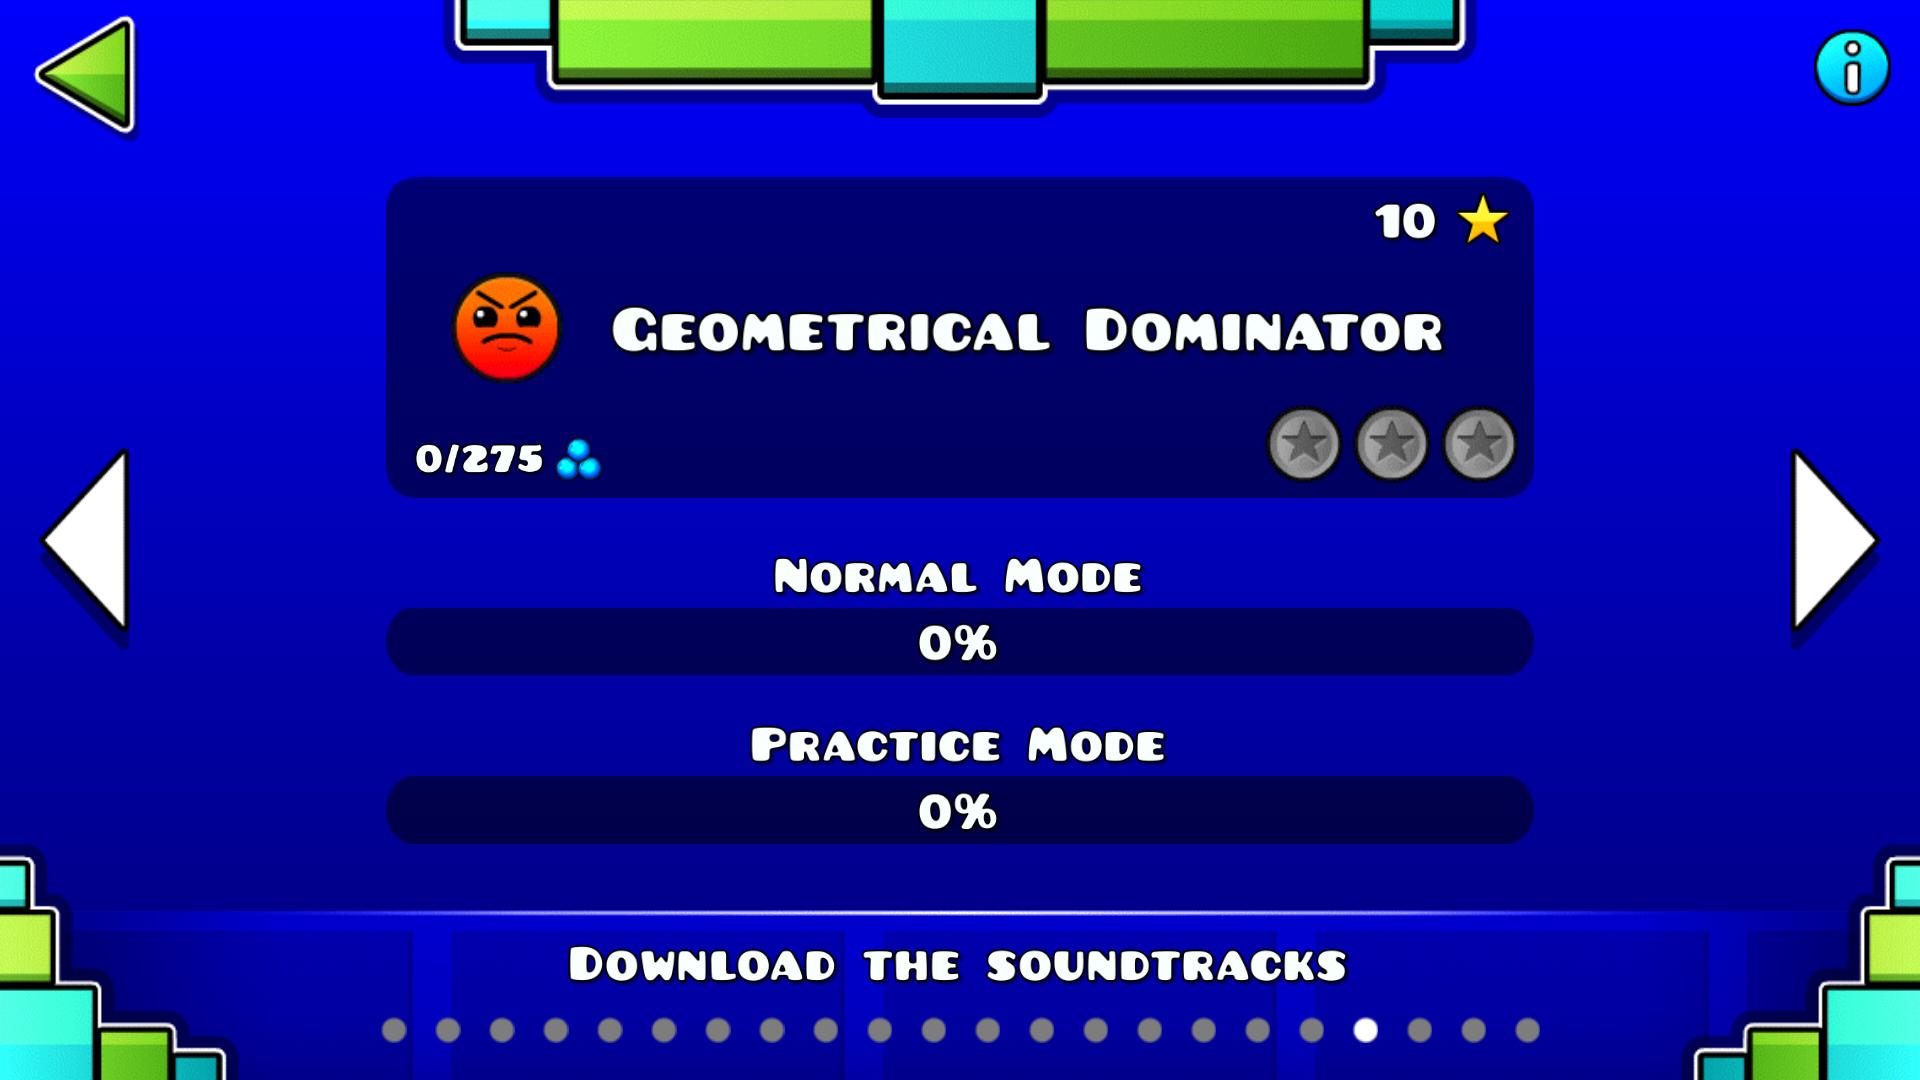 GeometricalDominatorMenu.png